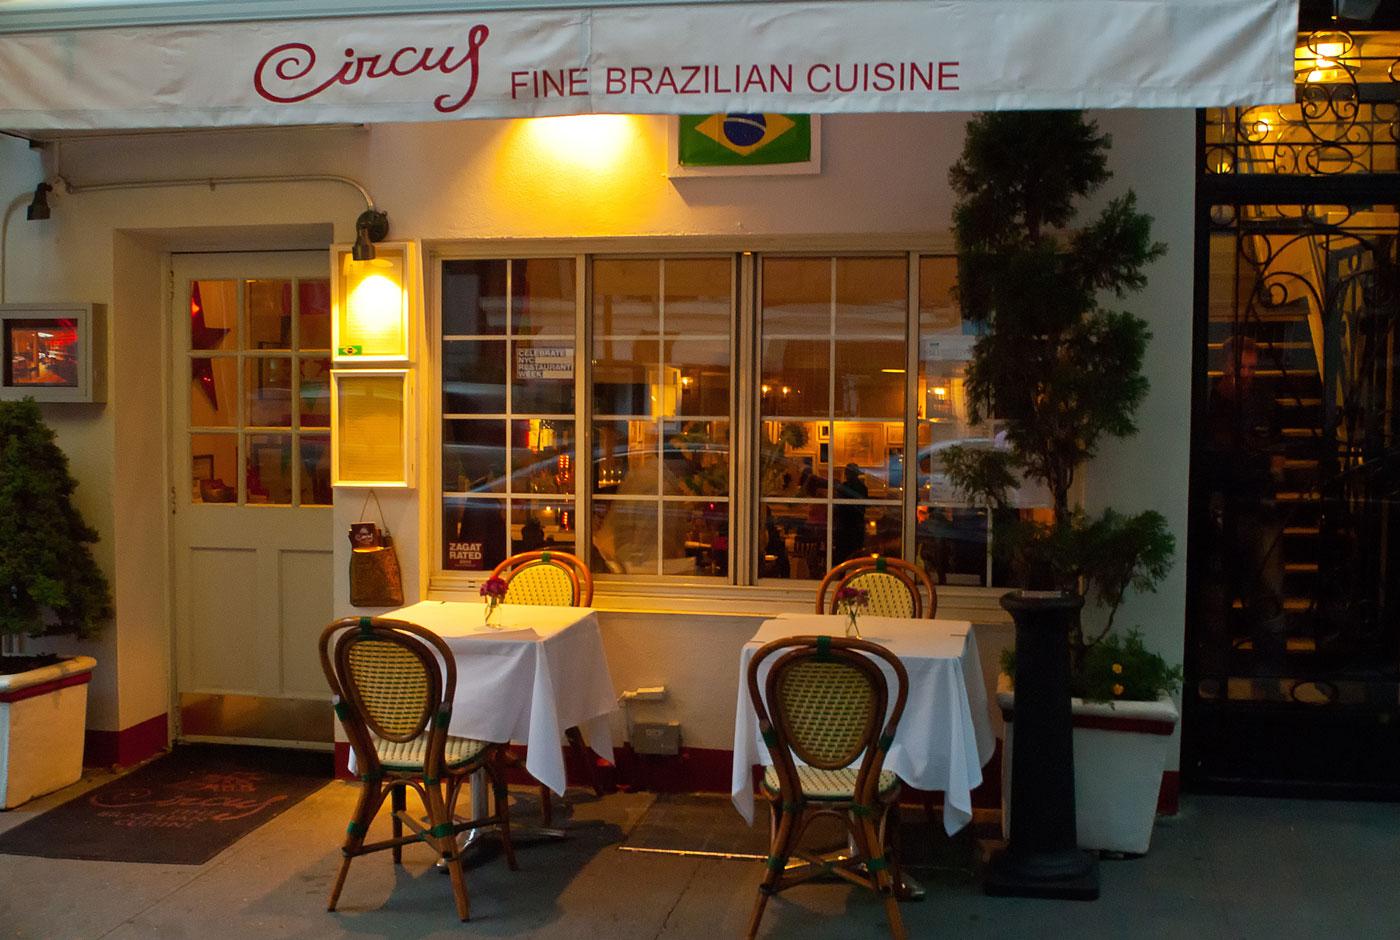 Circus restaurant nyc brazilian cuisine foodie adventures